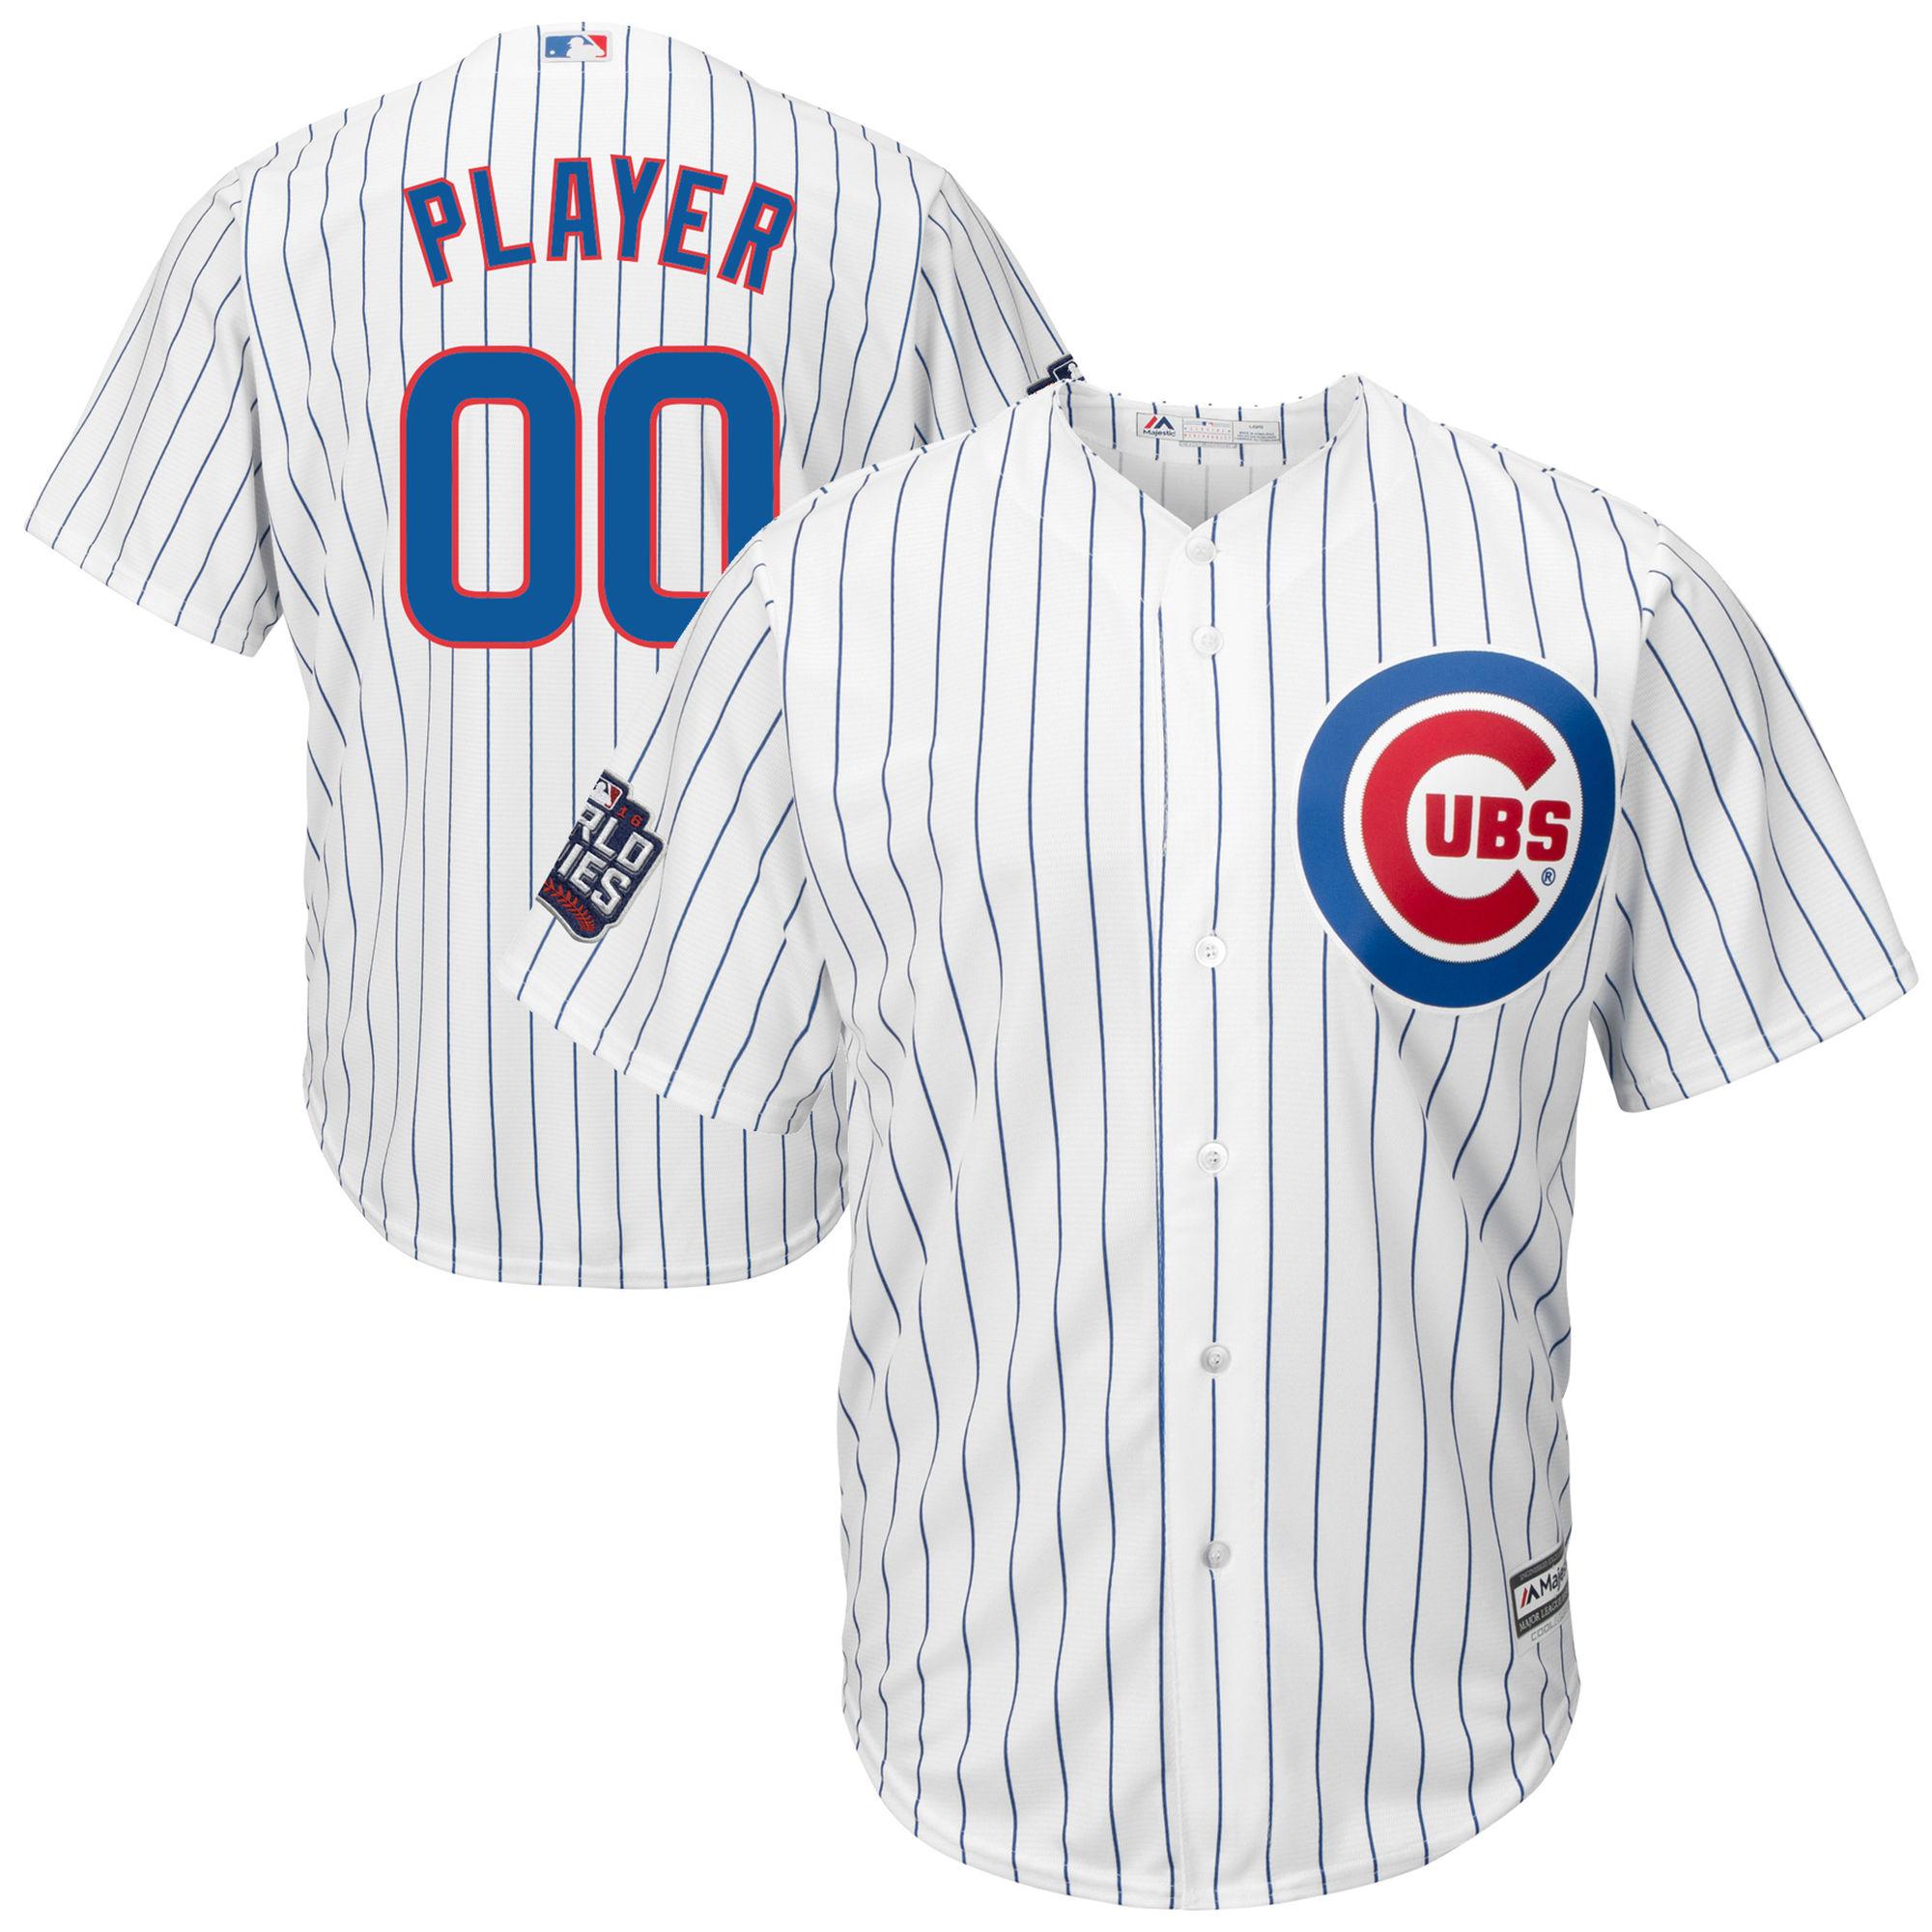 mlb customized jerseys, big and tall mlb jerseys, big and tall mlb apparel, custom cubs jersey